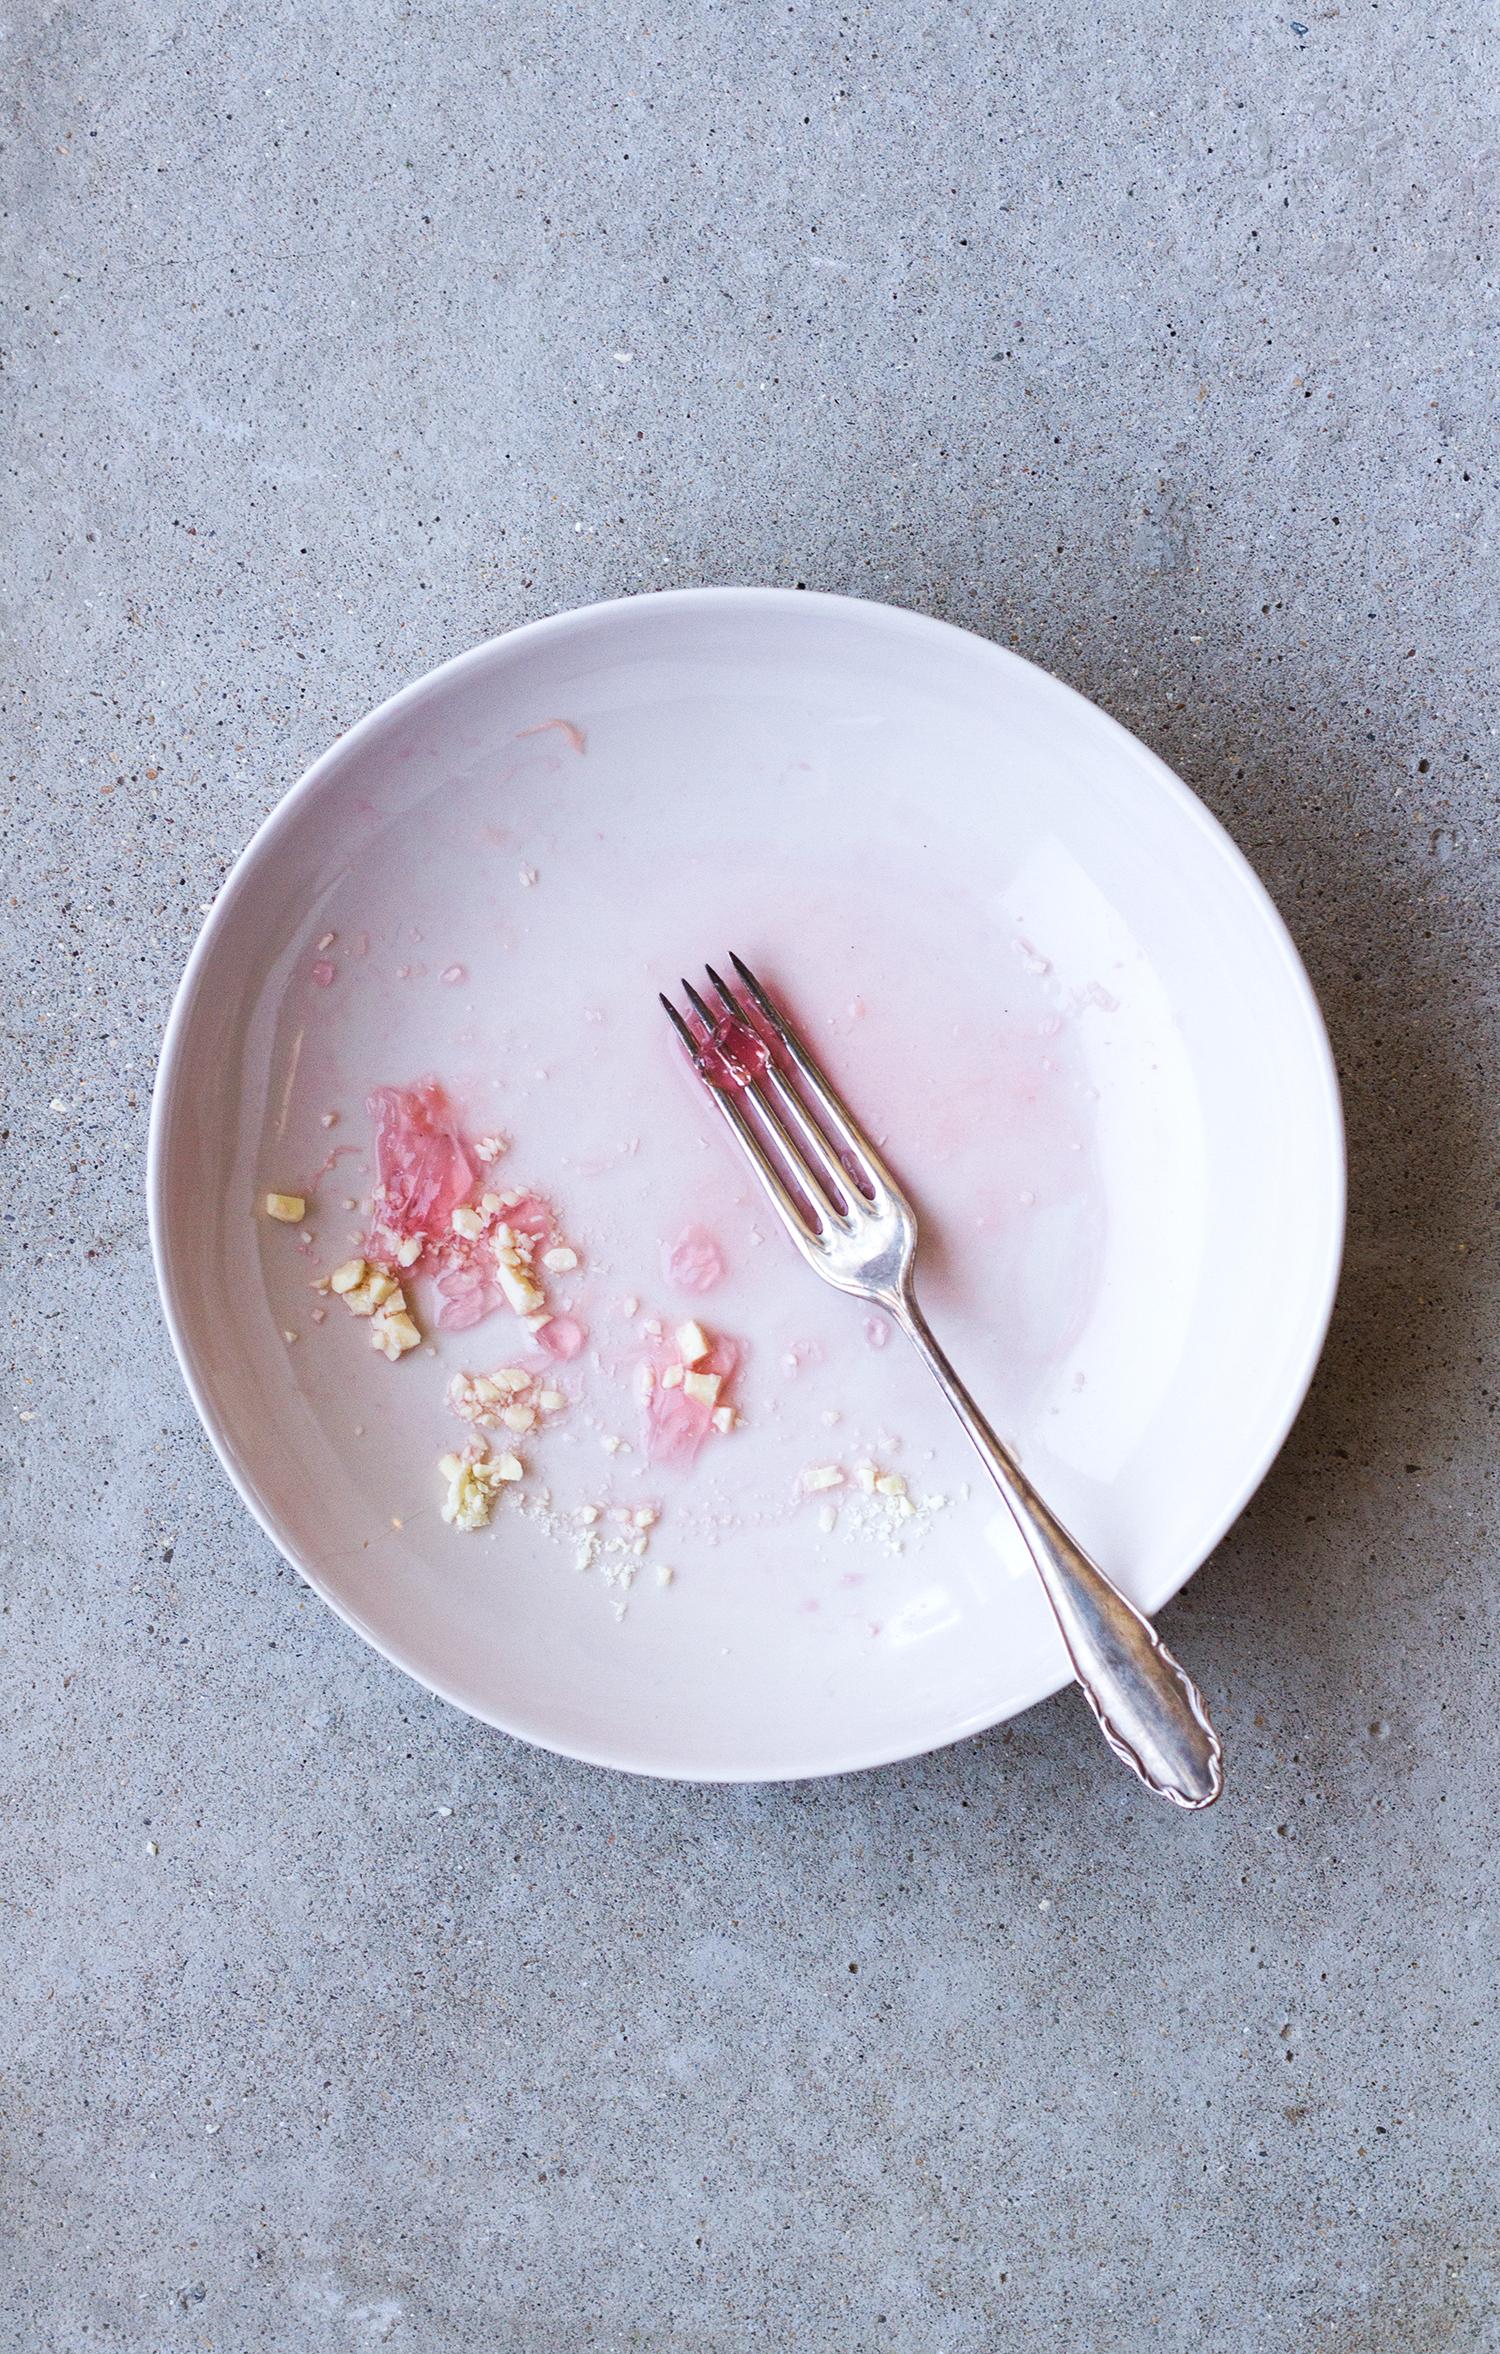 06_NOMNOM_Pfirsich-Rosé-Jelly.jpg